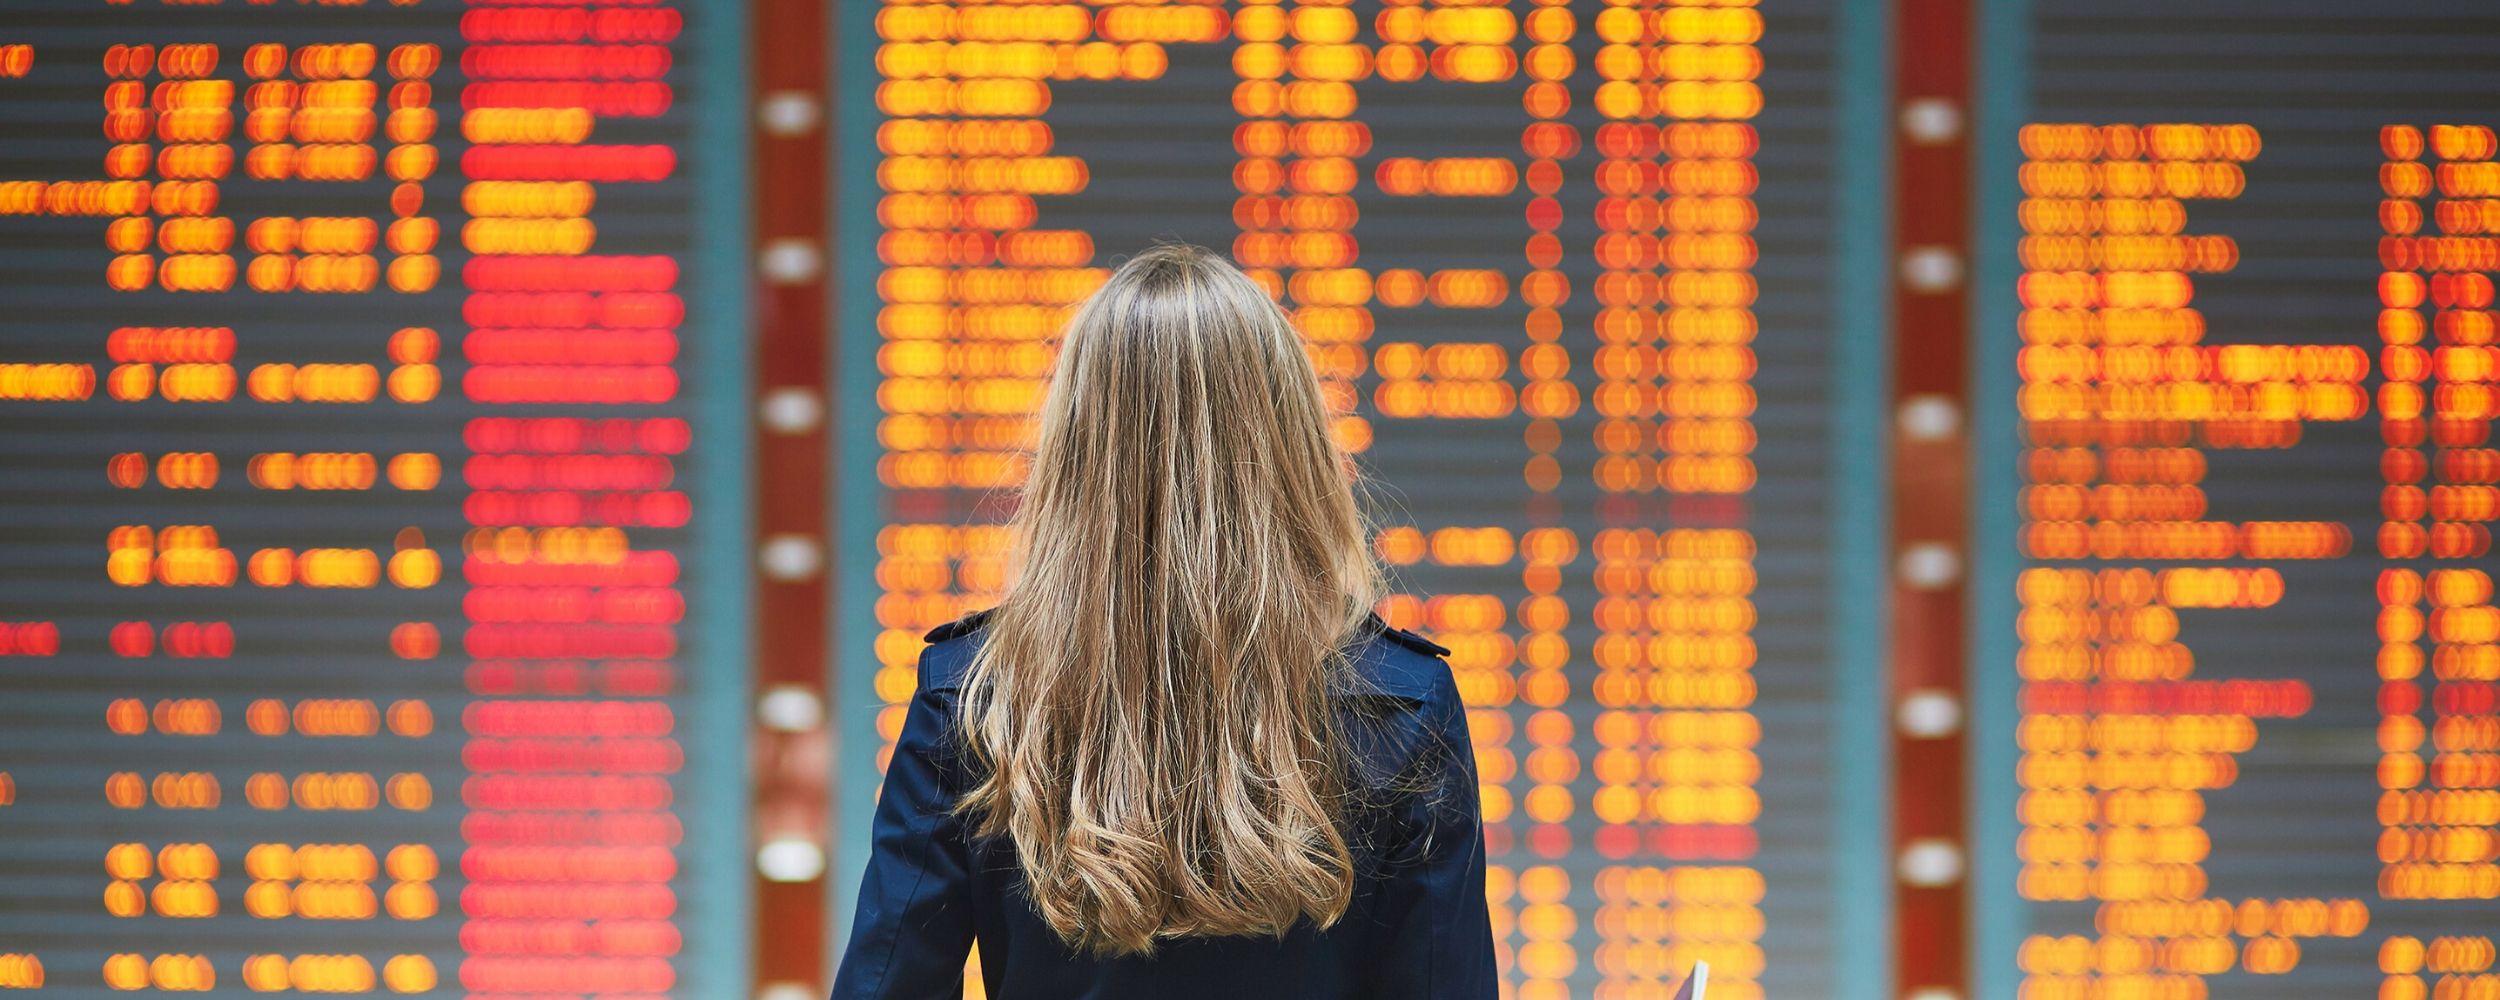 7 characteristics of Smart Tourist Destinations